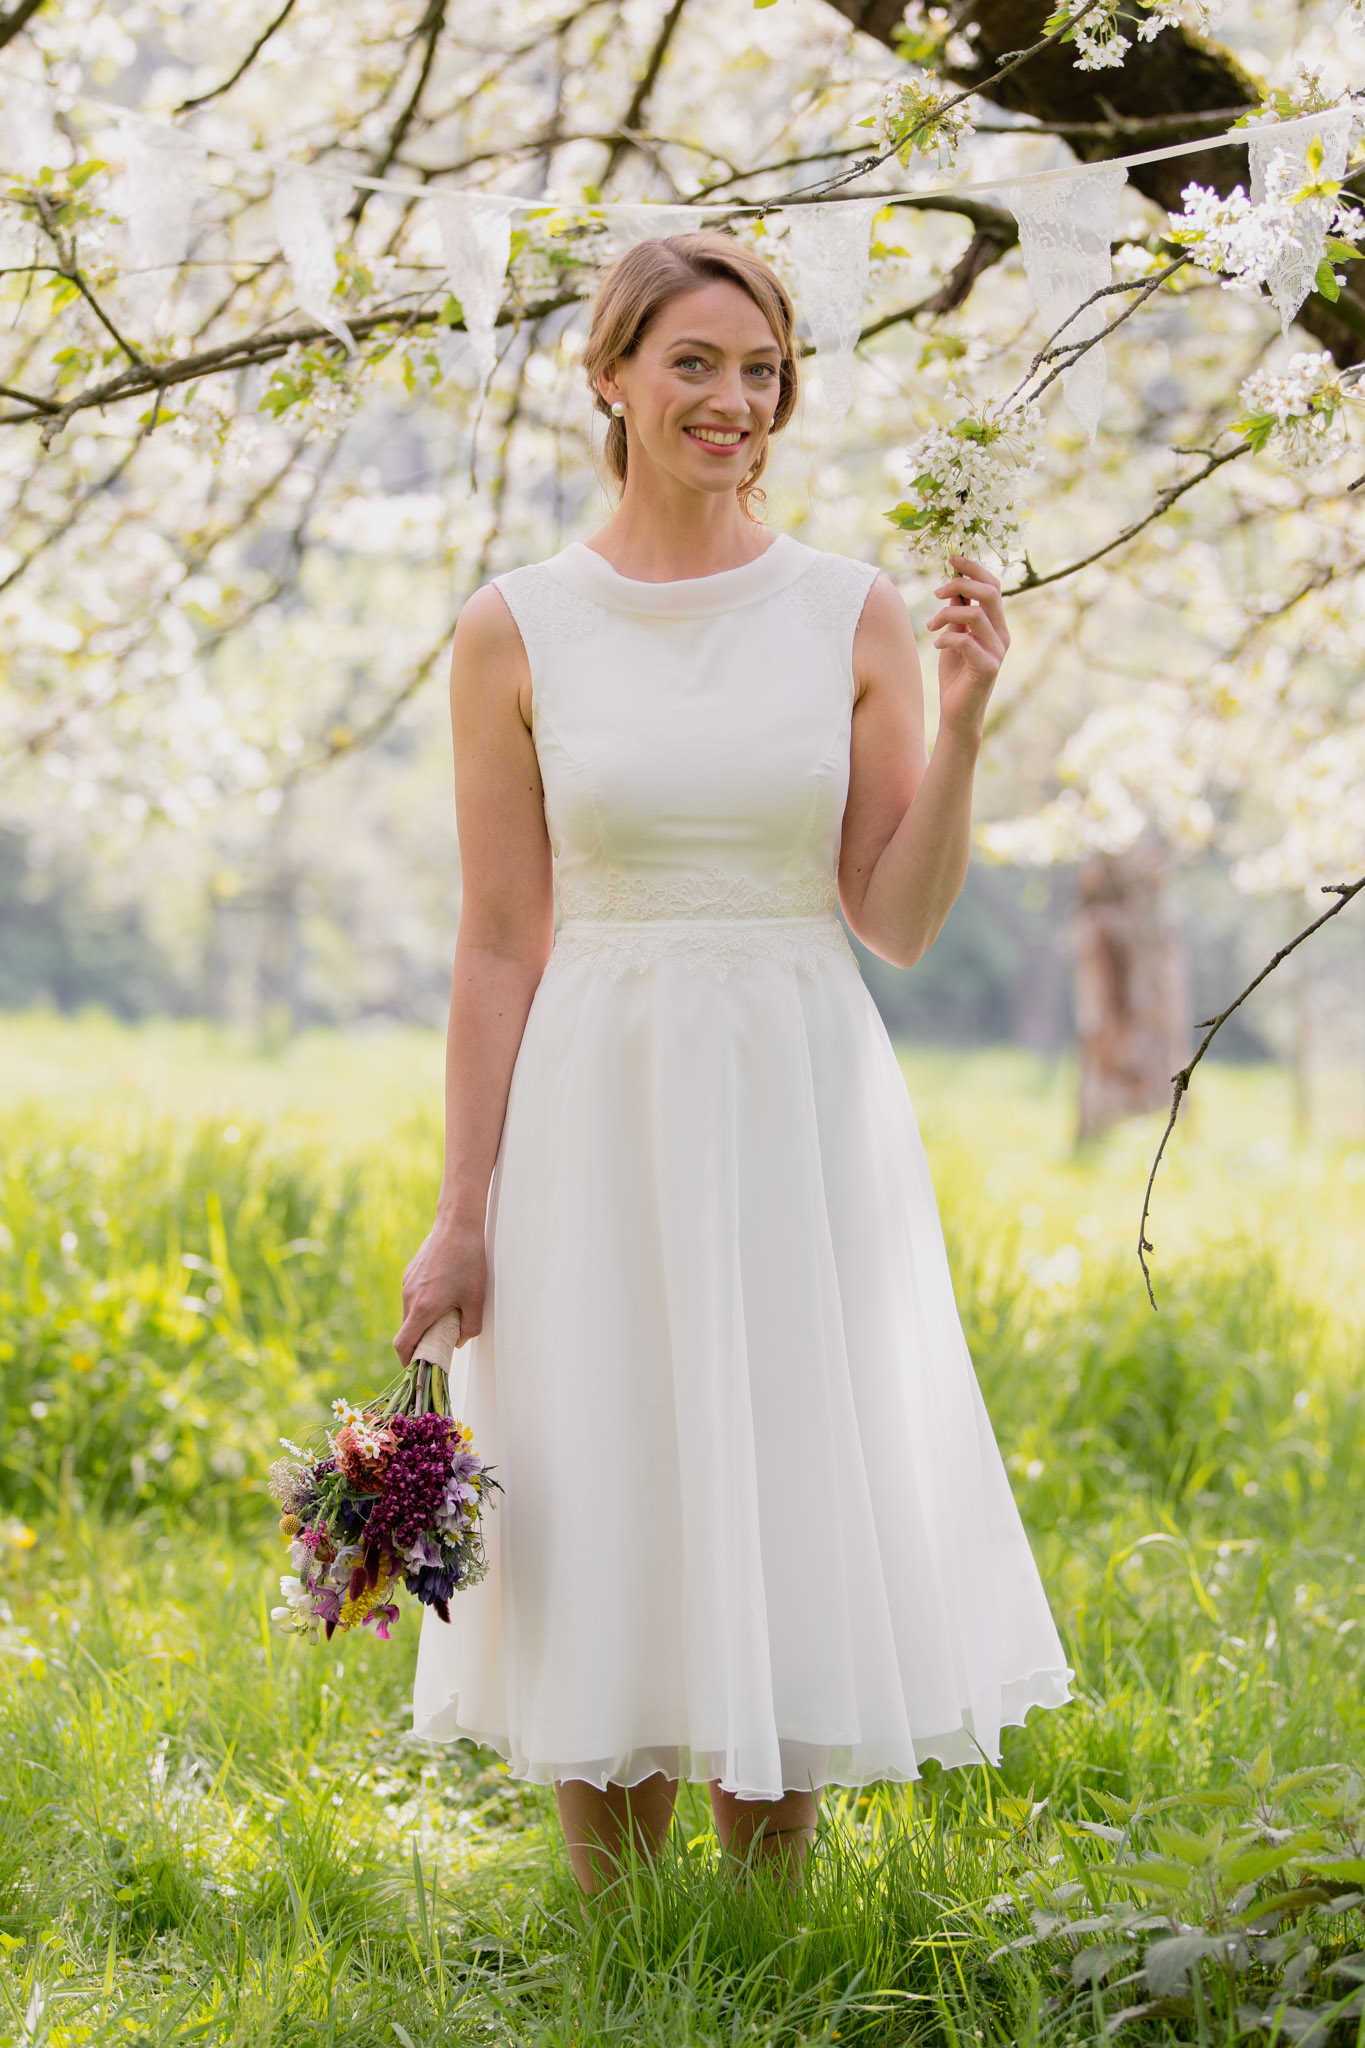 Schlichtes Brautkleid wadenlang mit Spitze - Rosalia  Claudia Heller